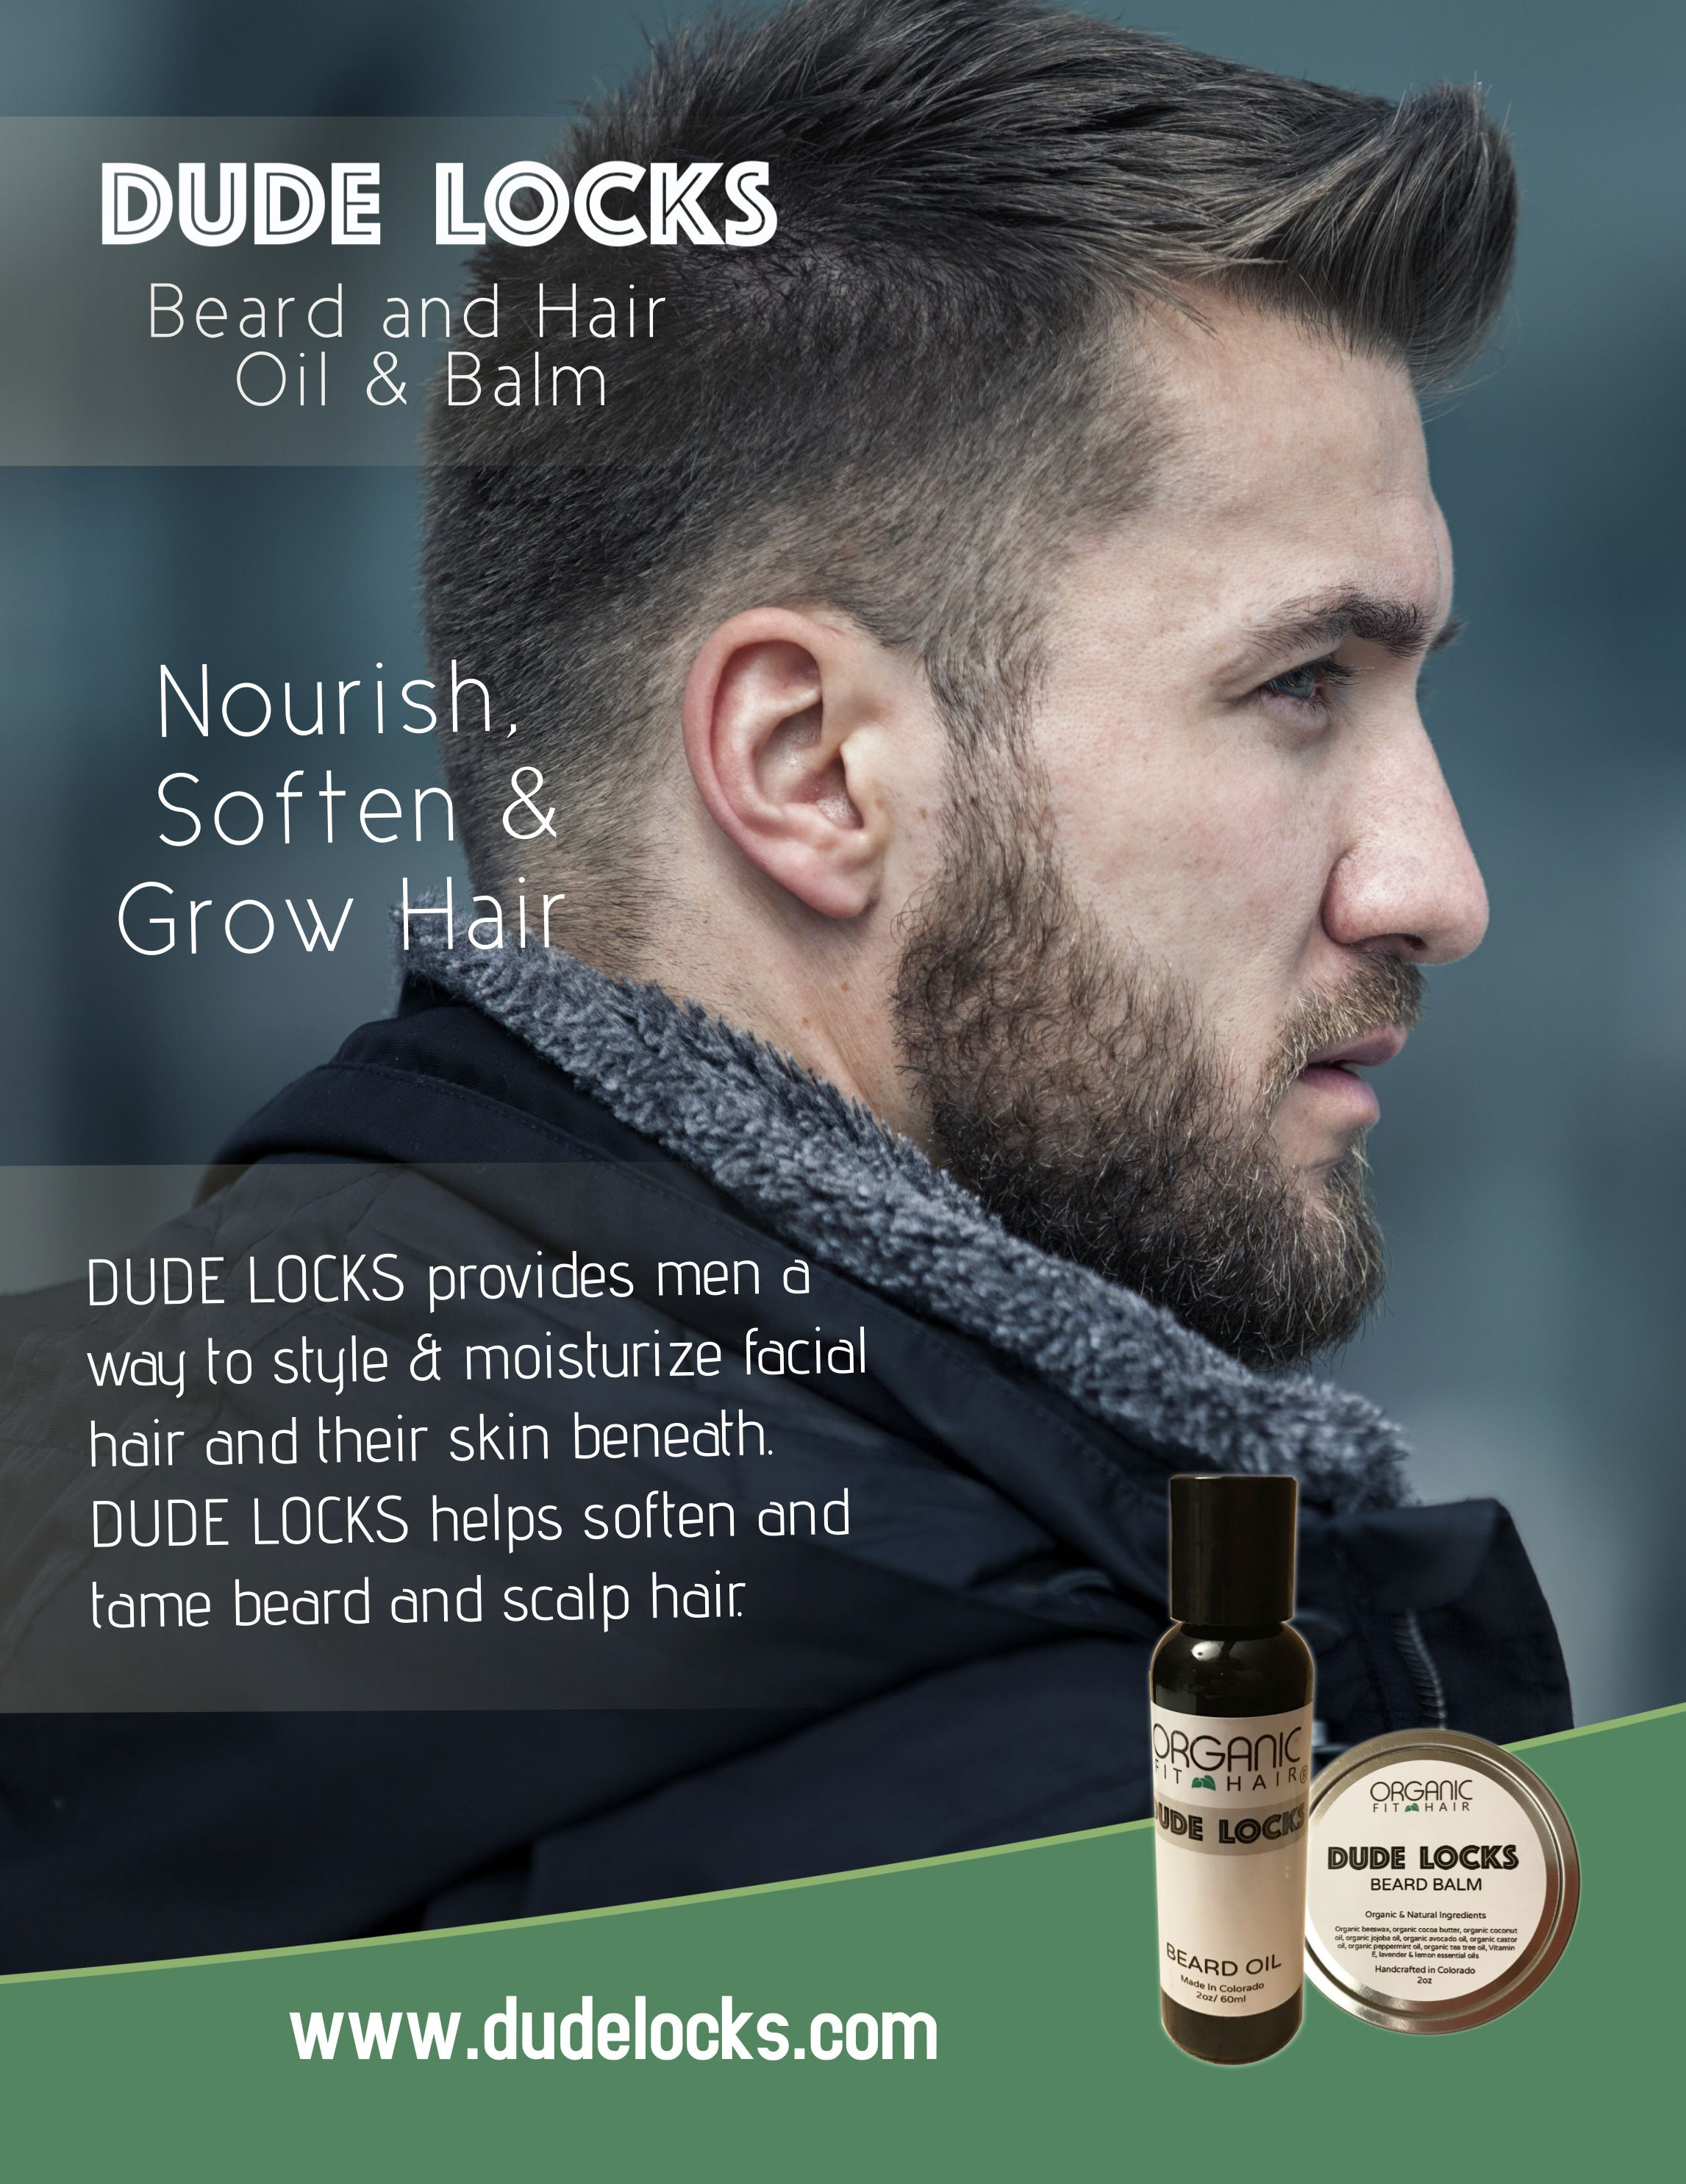 Nourish soften grow groom your beard and hair beard